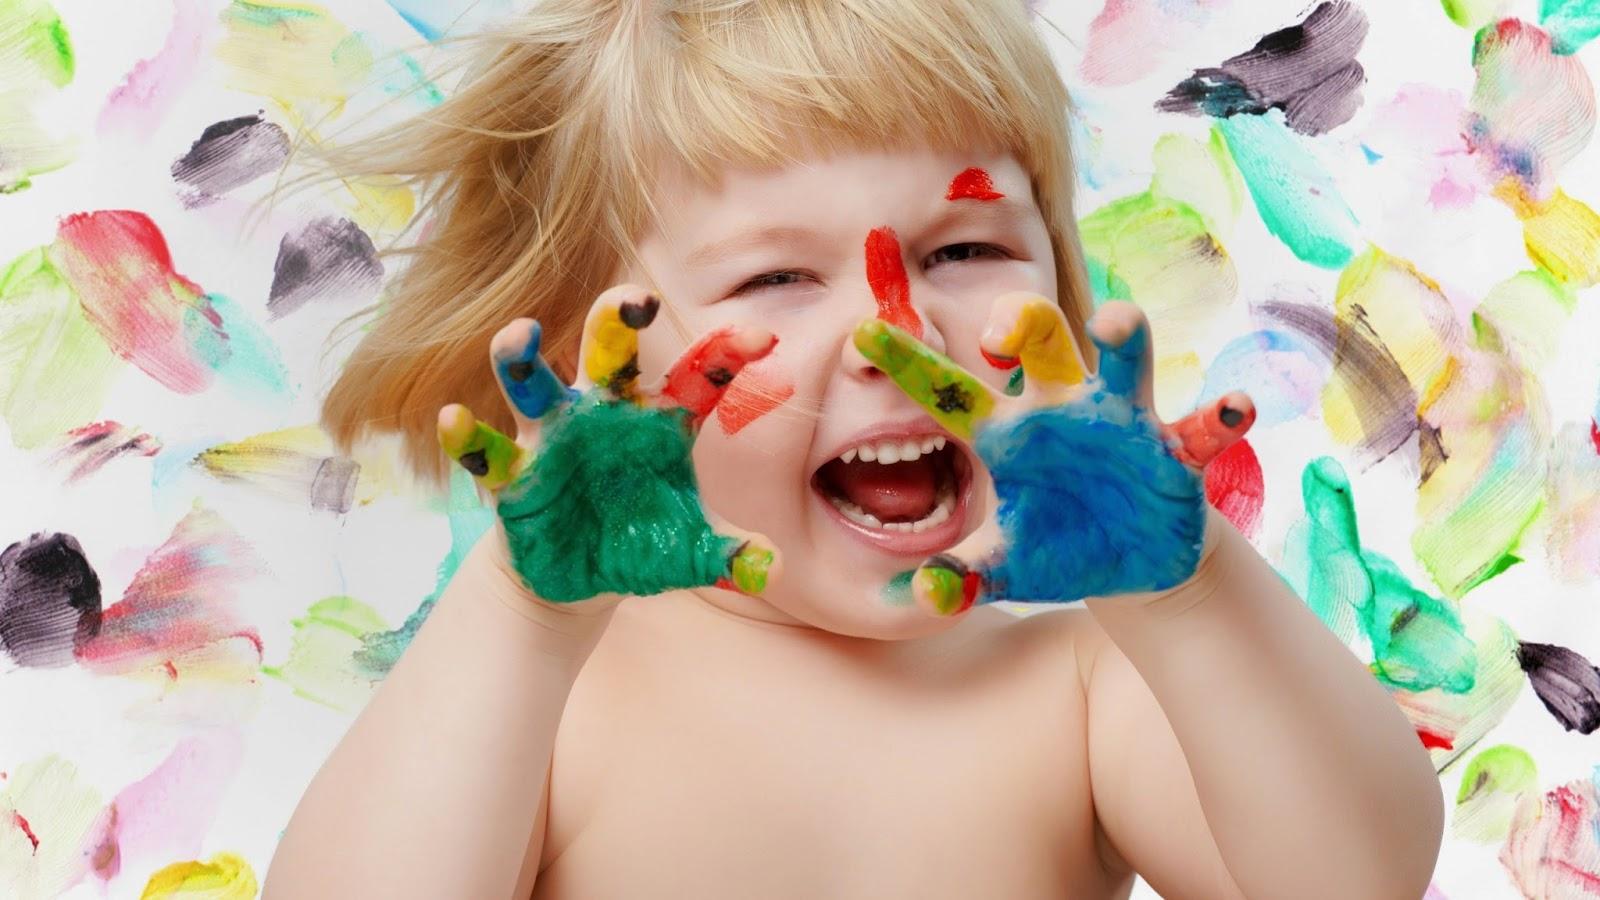 Windows 8 Hd Wallpapers Cute Kids Wallpapers Episode 3